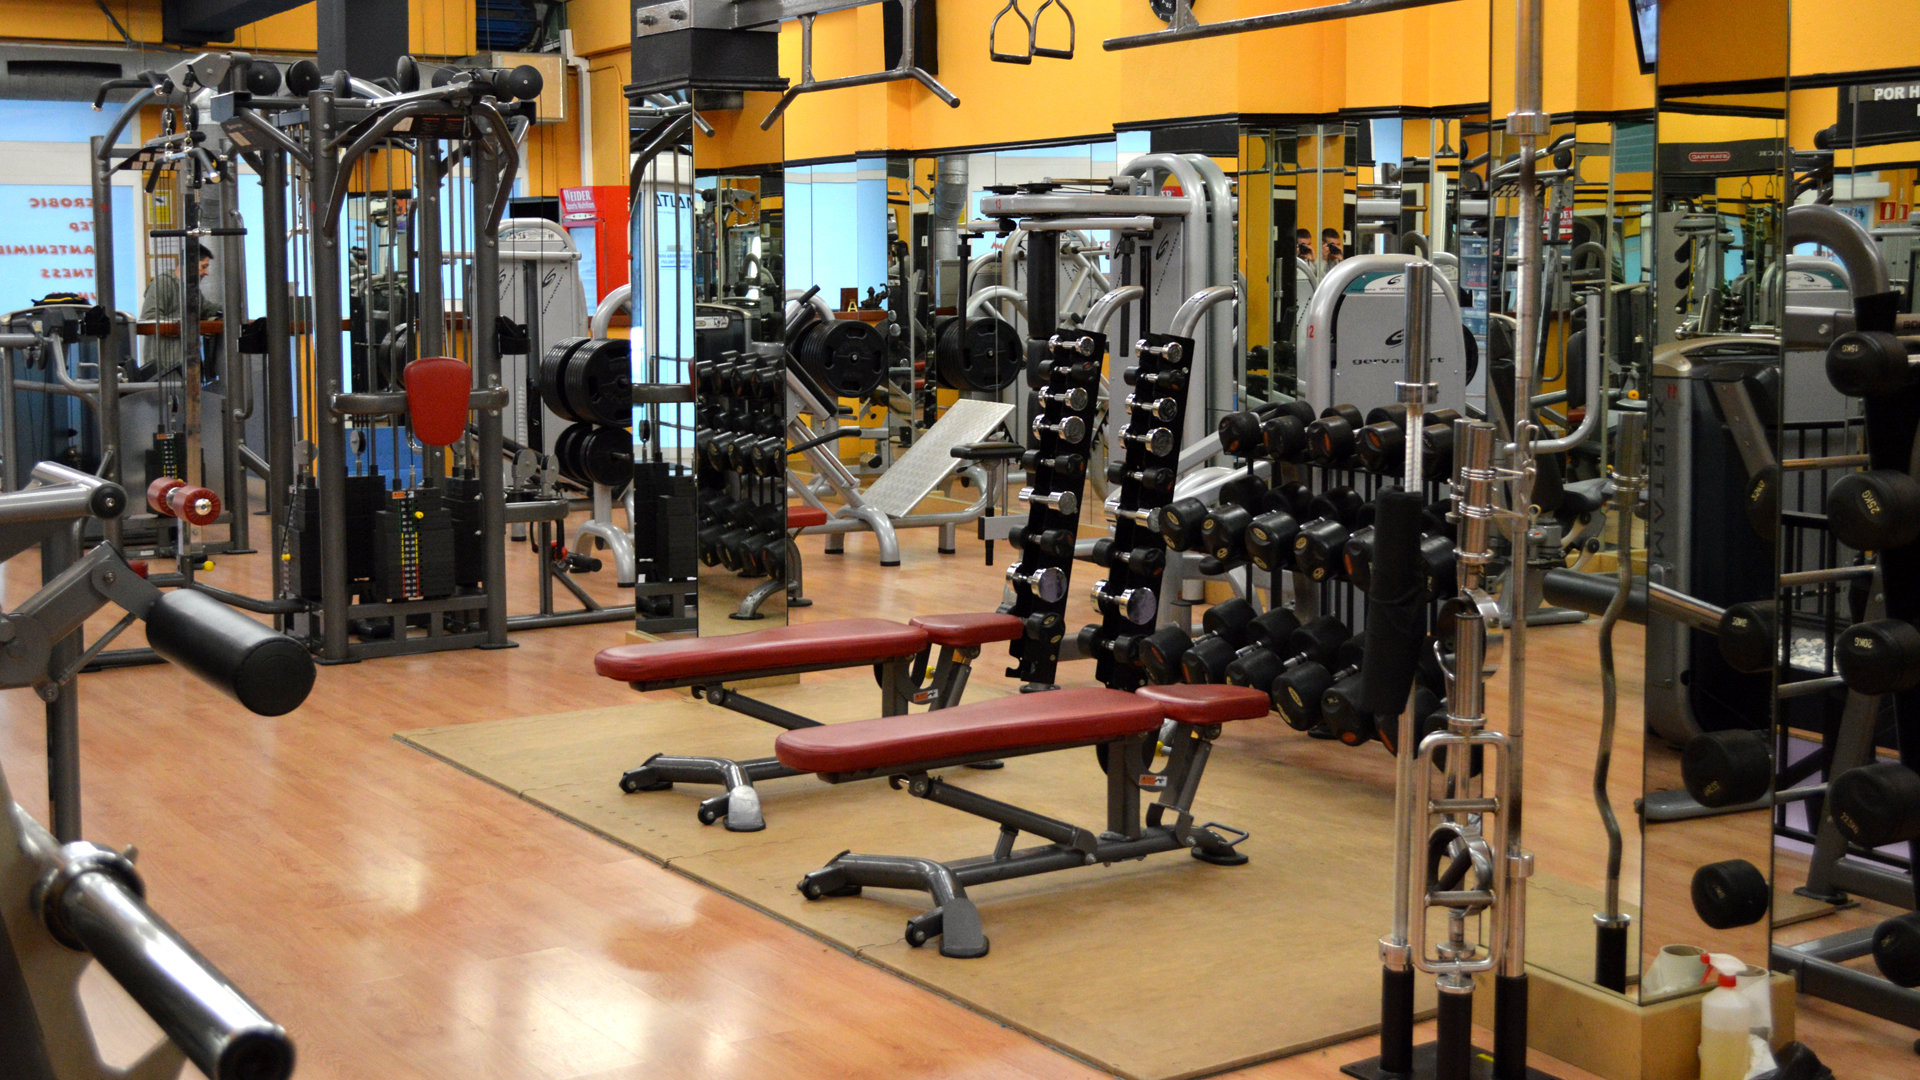 gym atlanta studio gimnasio palma de mallorca